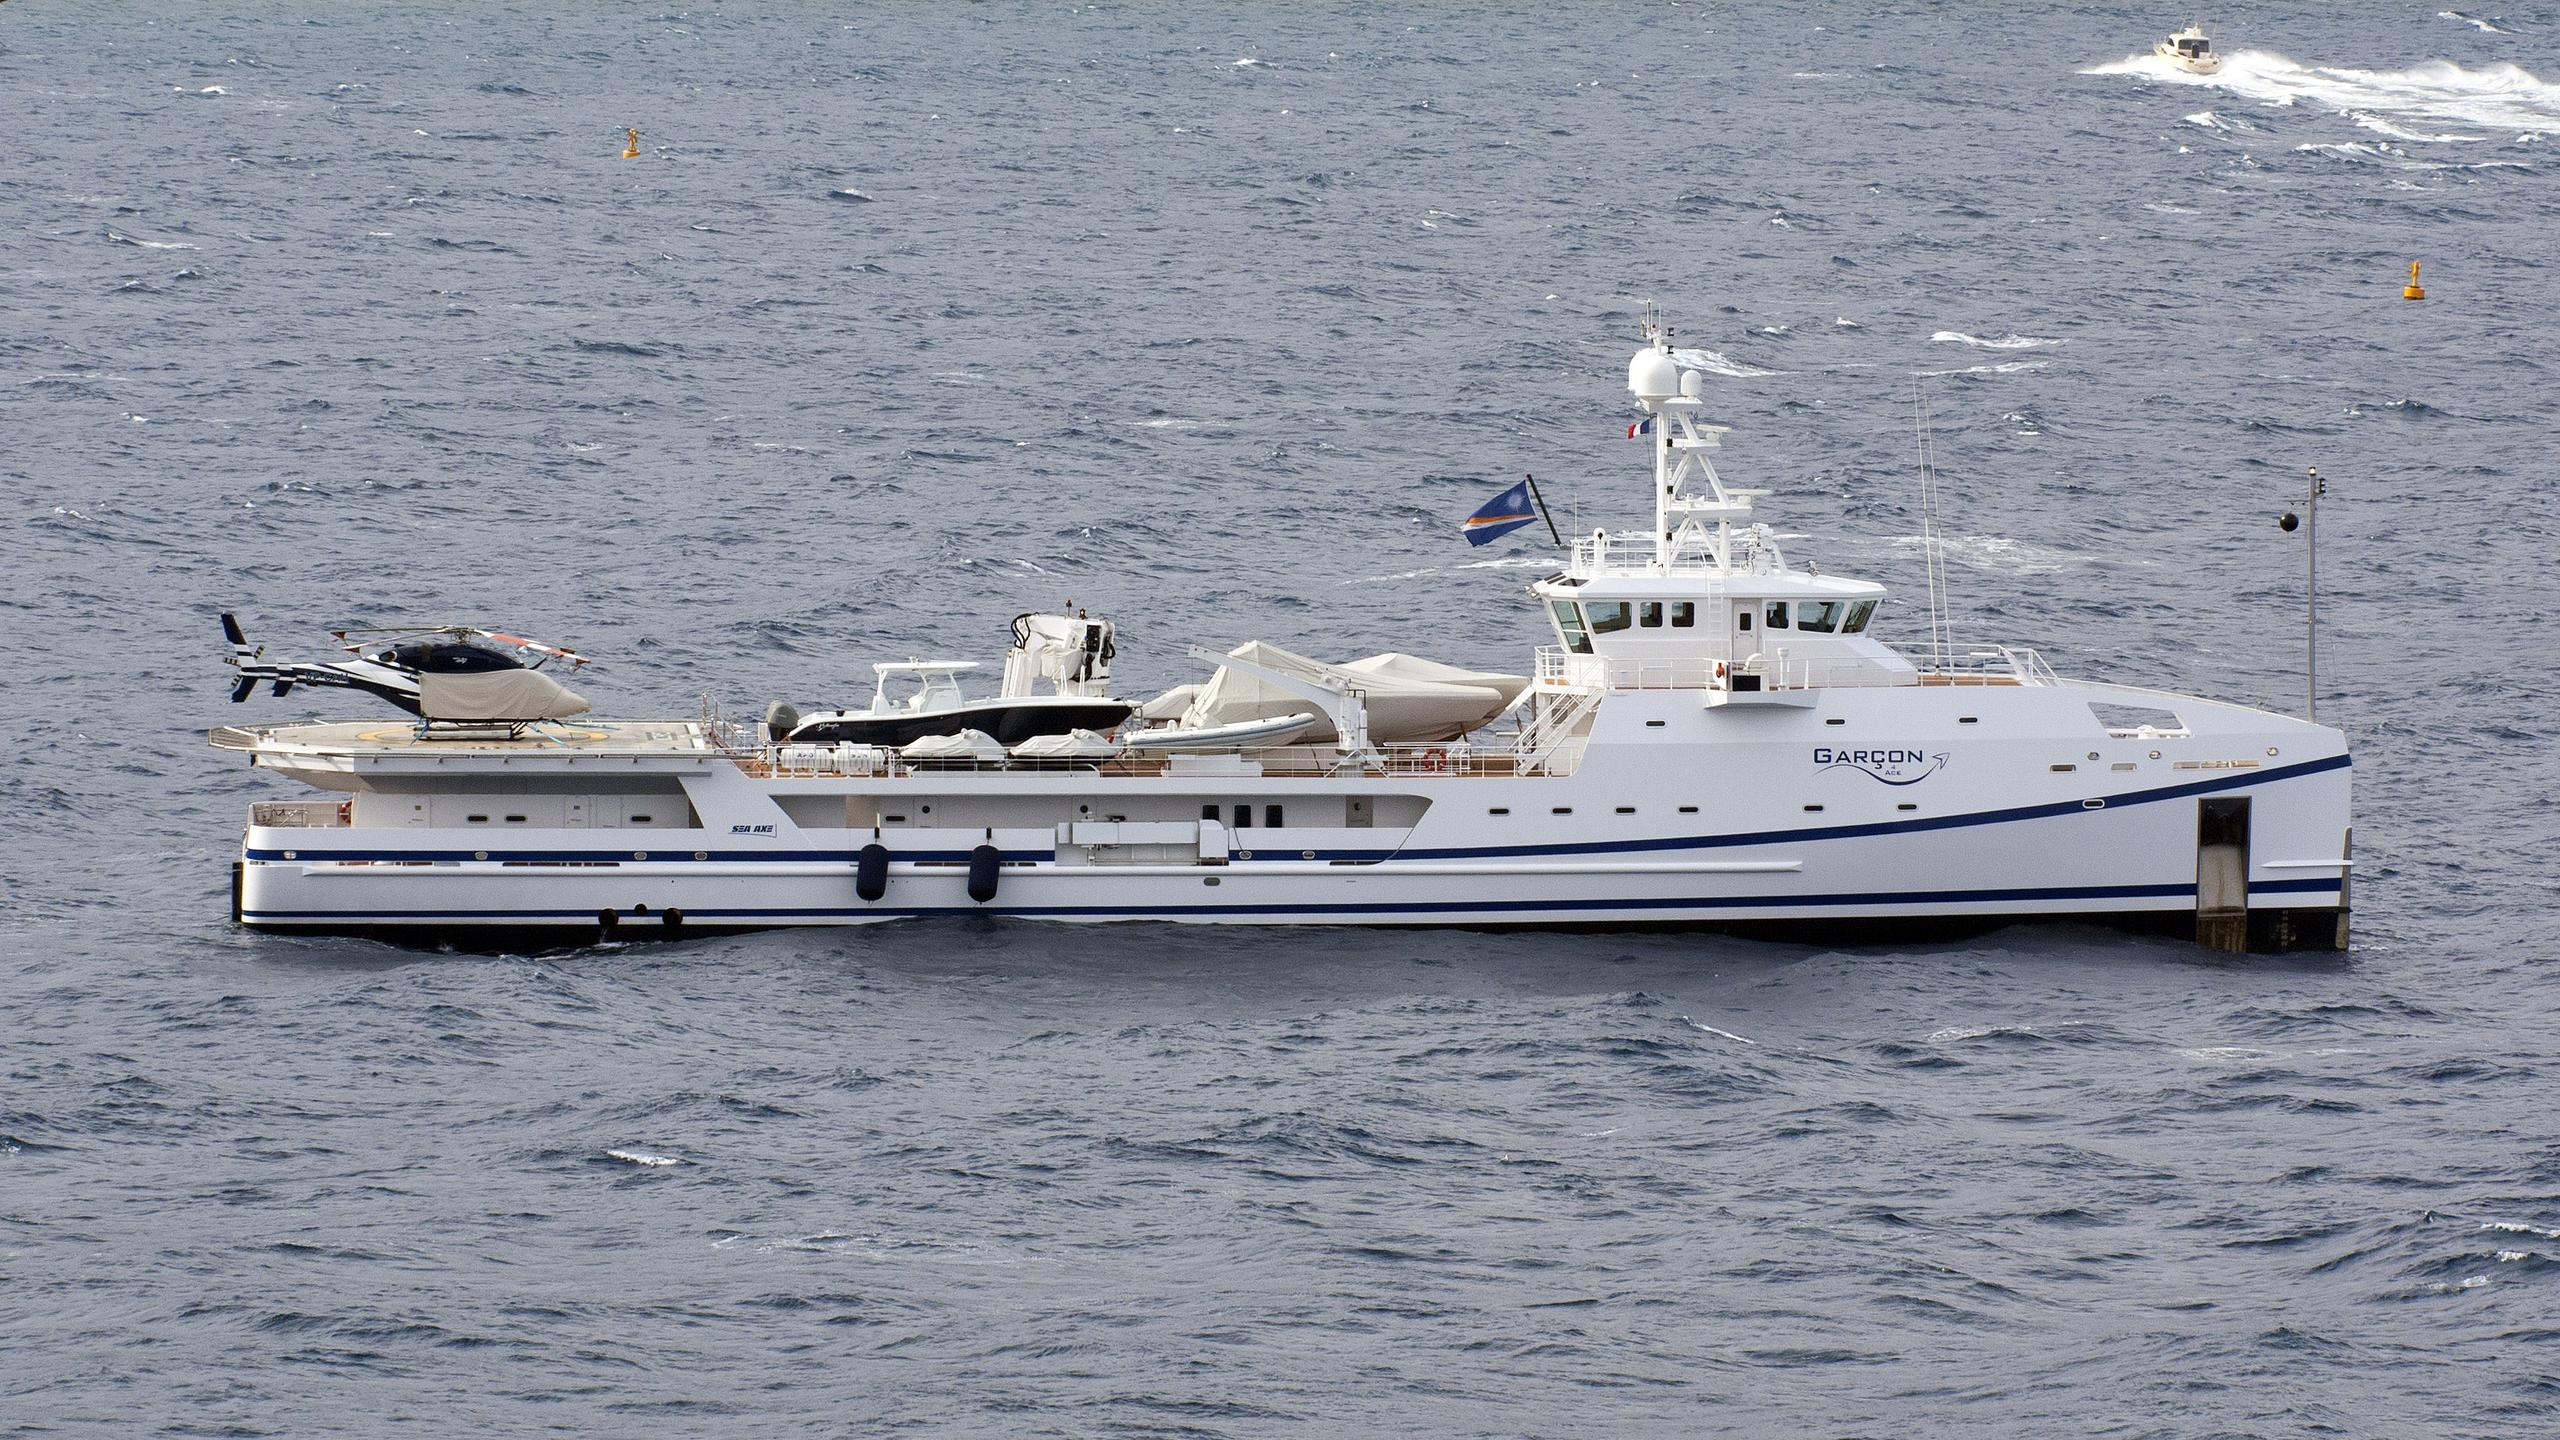 garcon-explorer-yacht-damen-2012-67m-profile